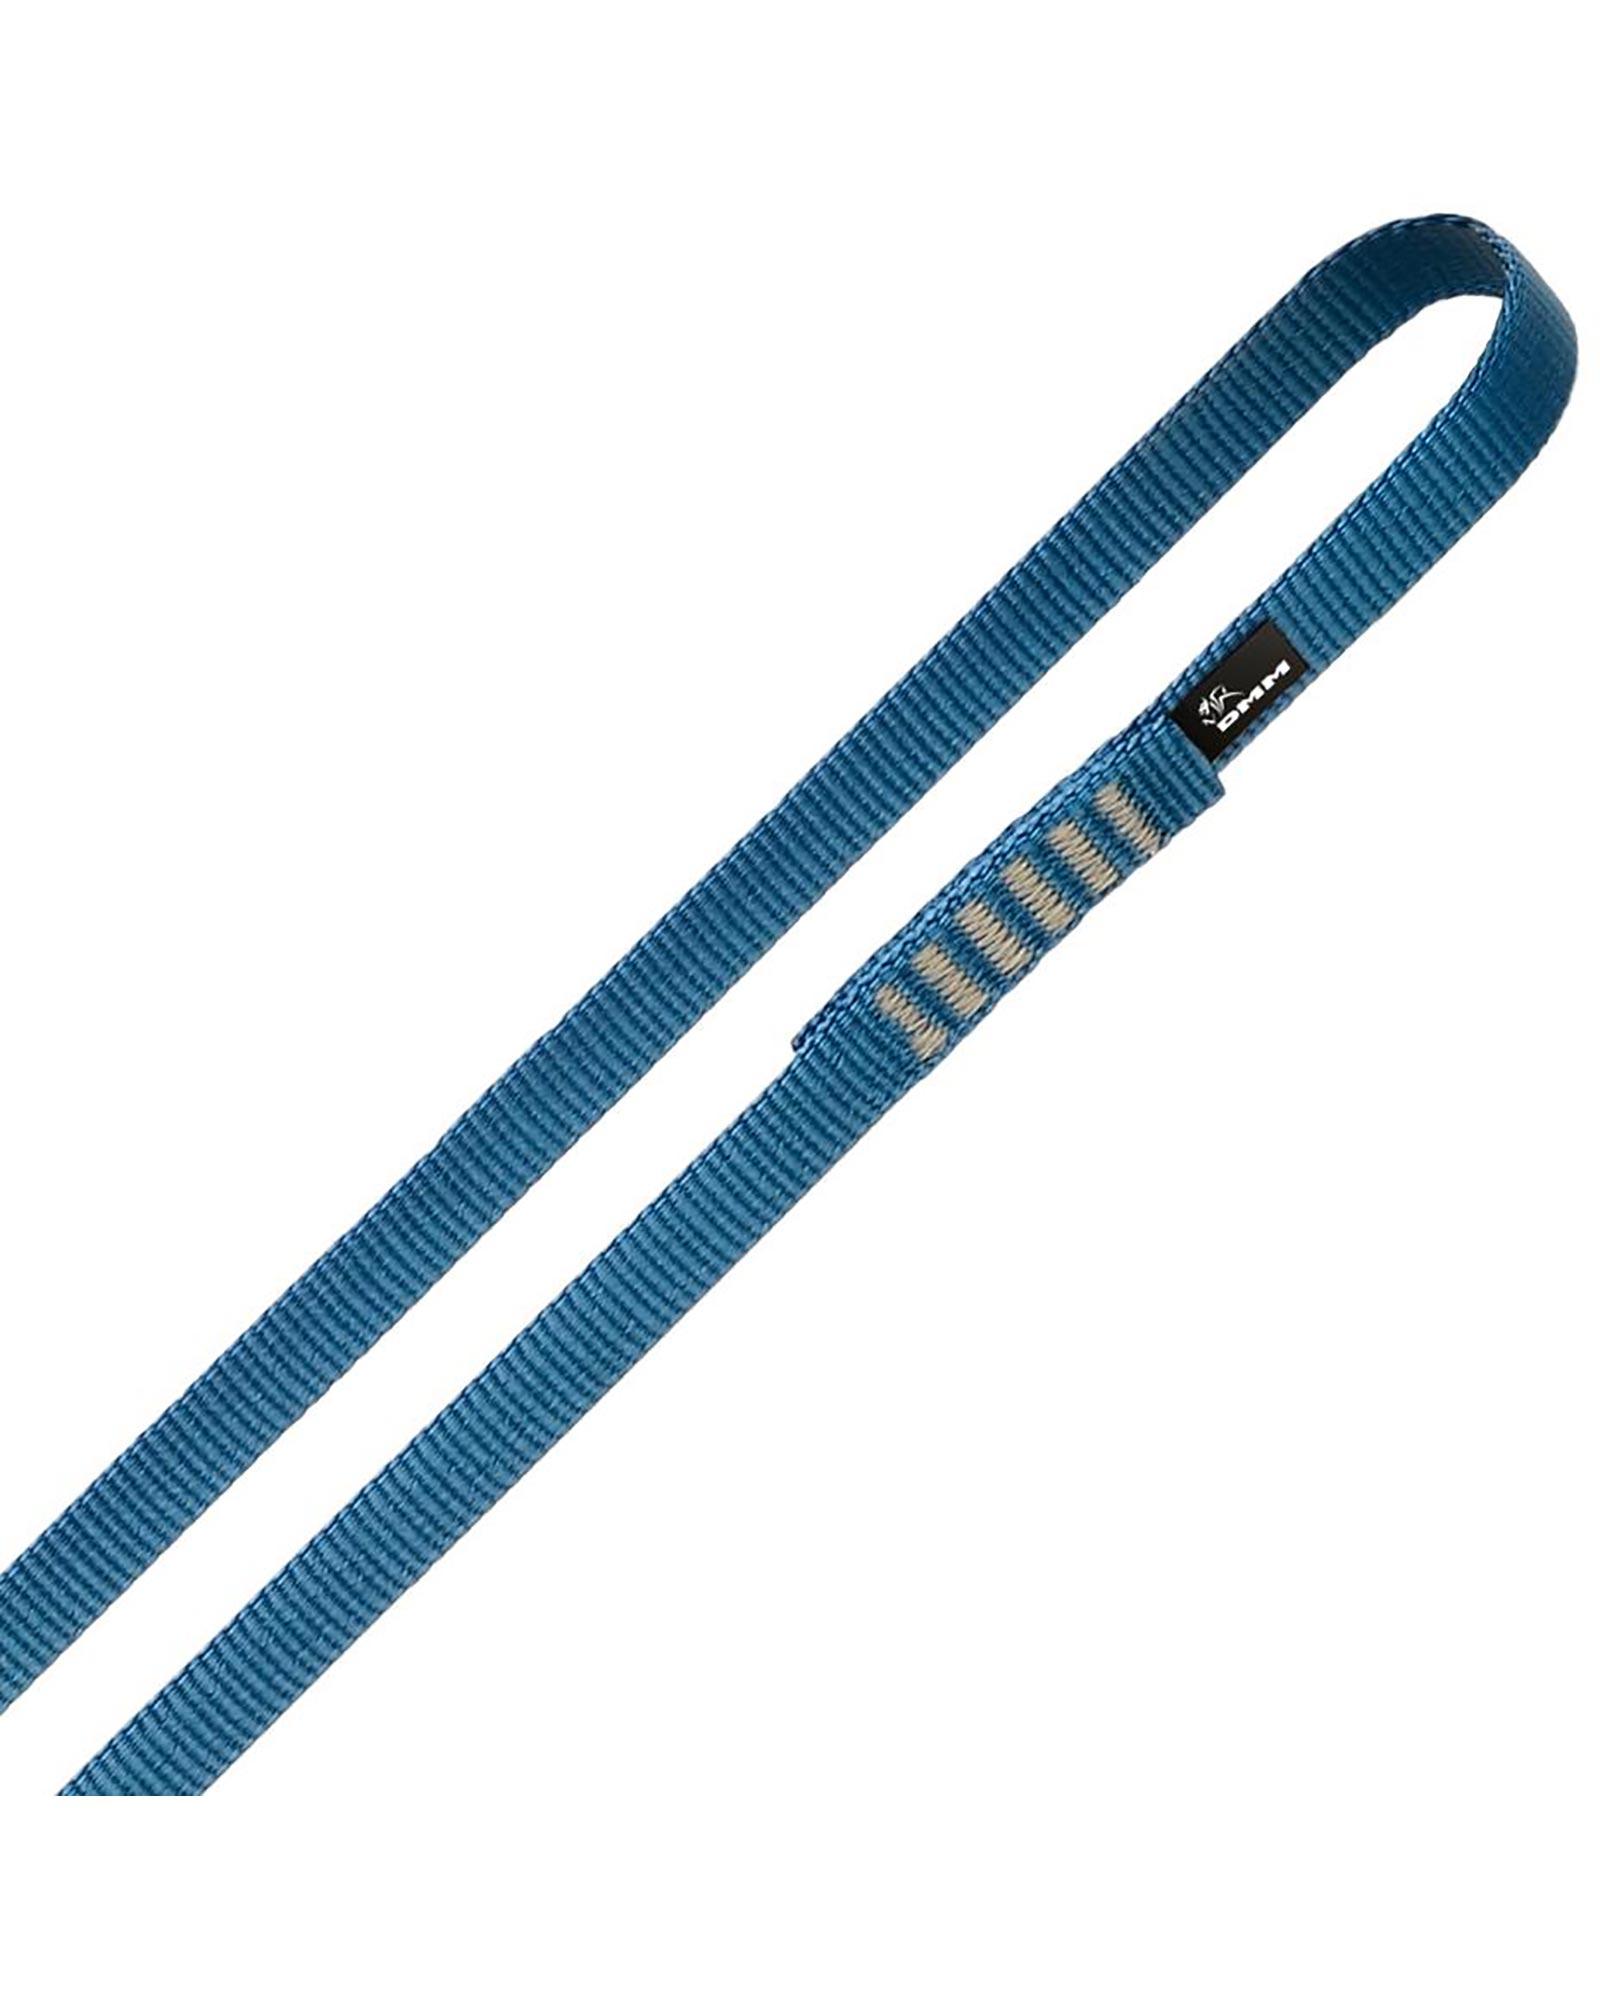 Product image of DMM 16mm x 120cm Nylon Sling